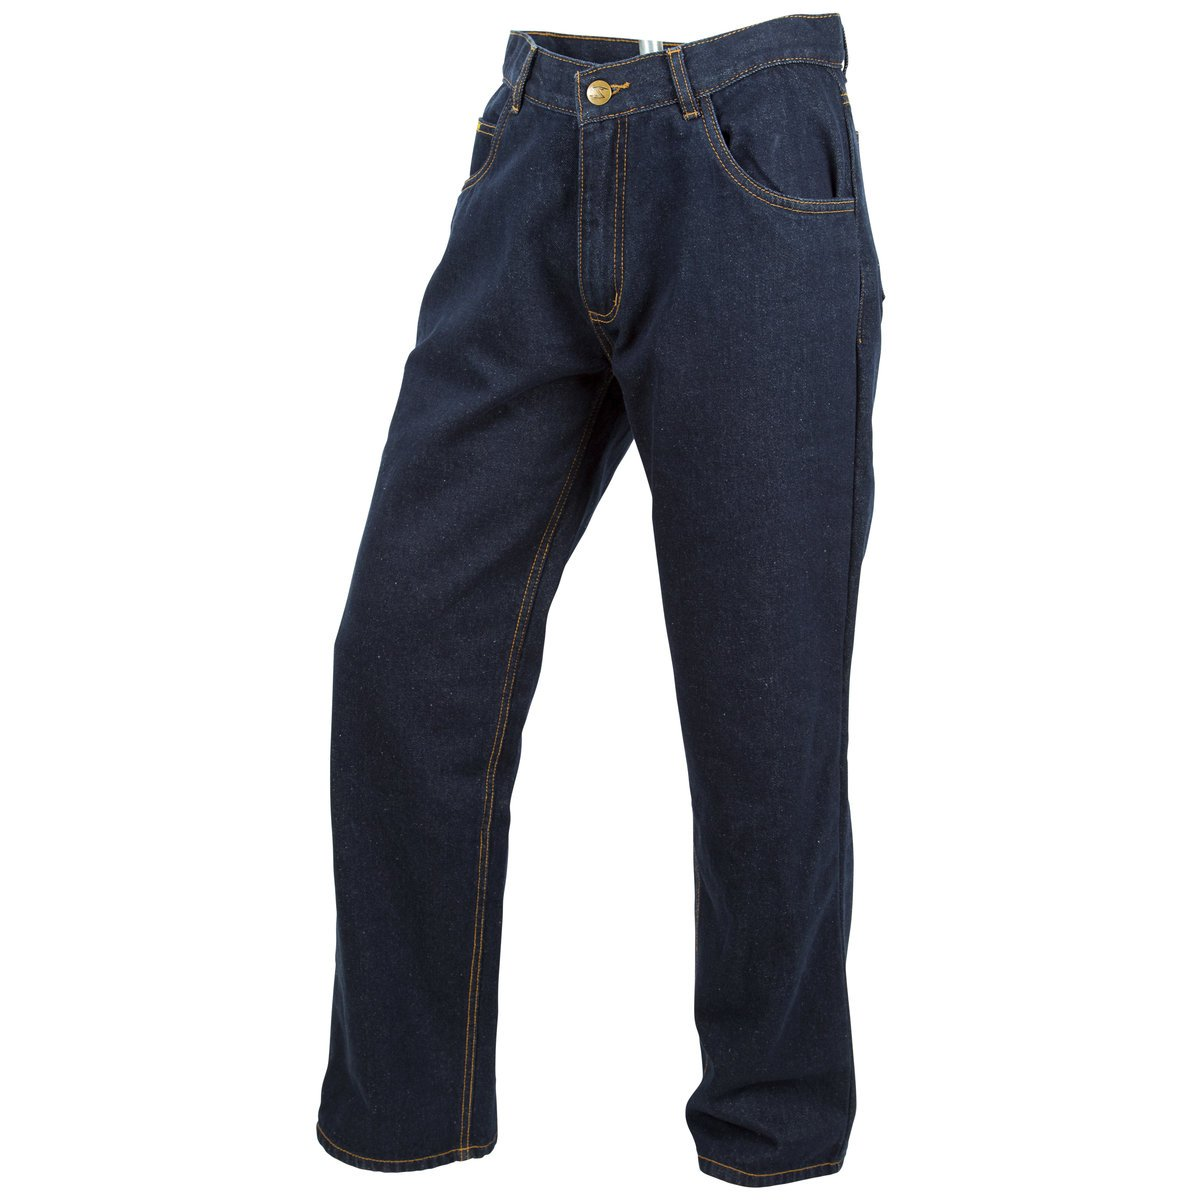 Scorpion EXO Men's Covert Blue Jeans, 42